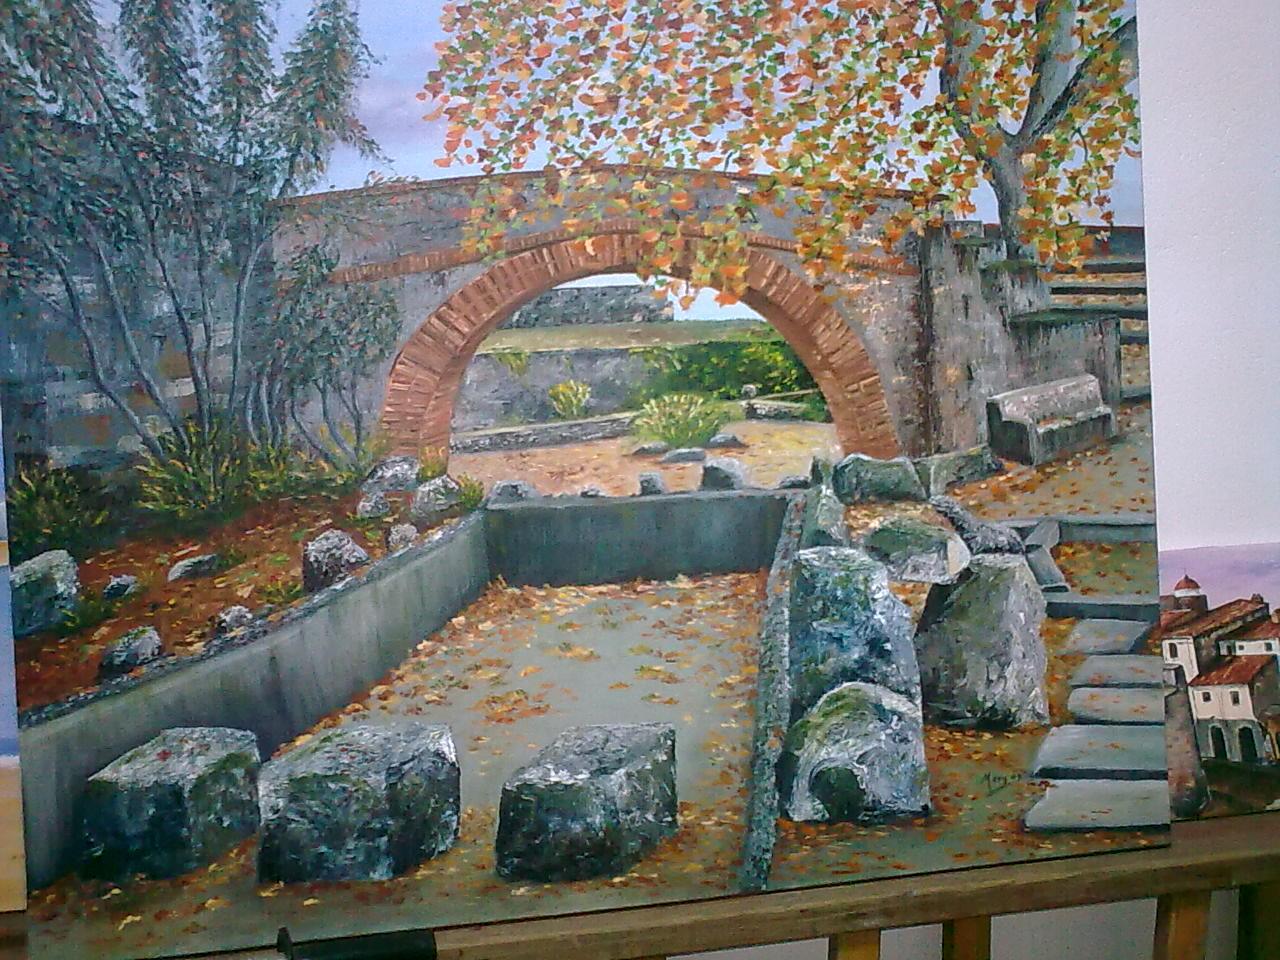 Manitas mery jardines de badajoz oleo sobre lienzo - Oleos de jardines ...